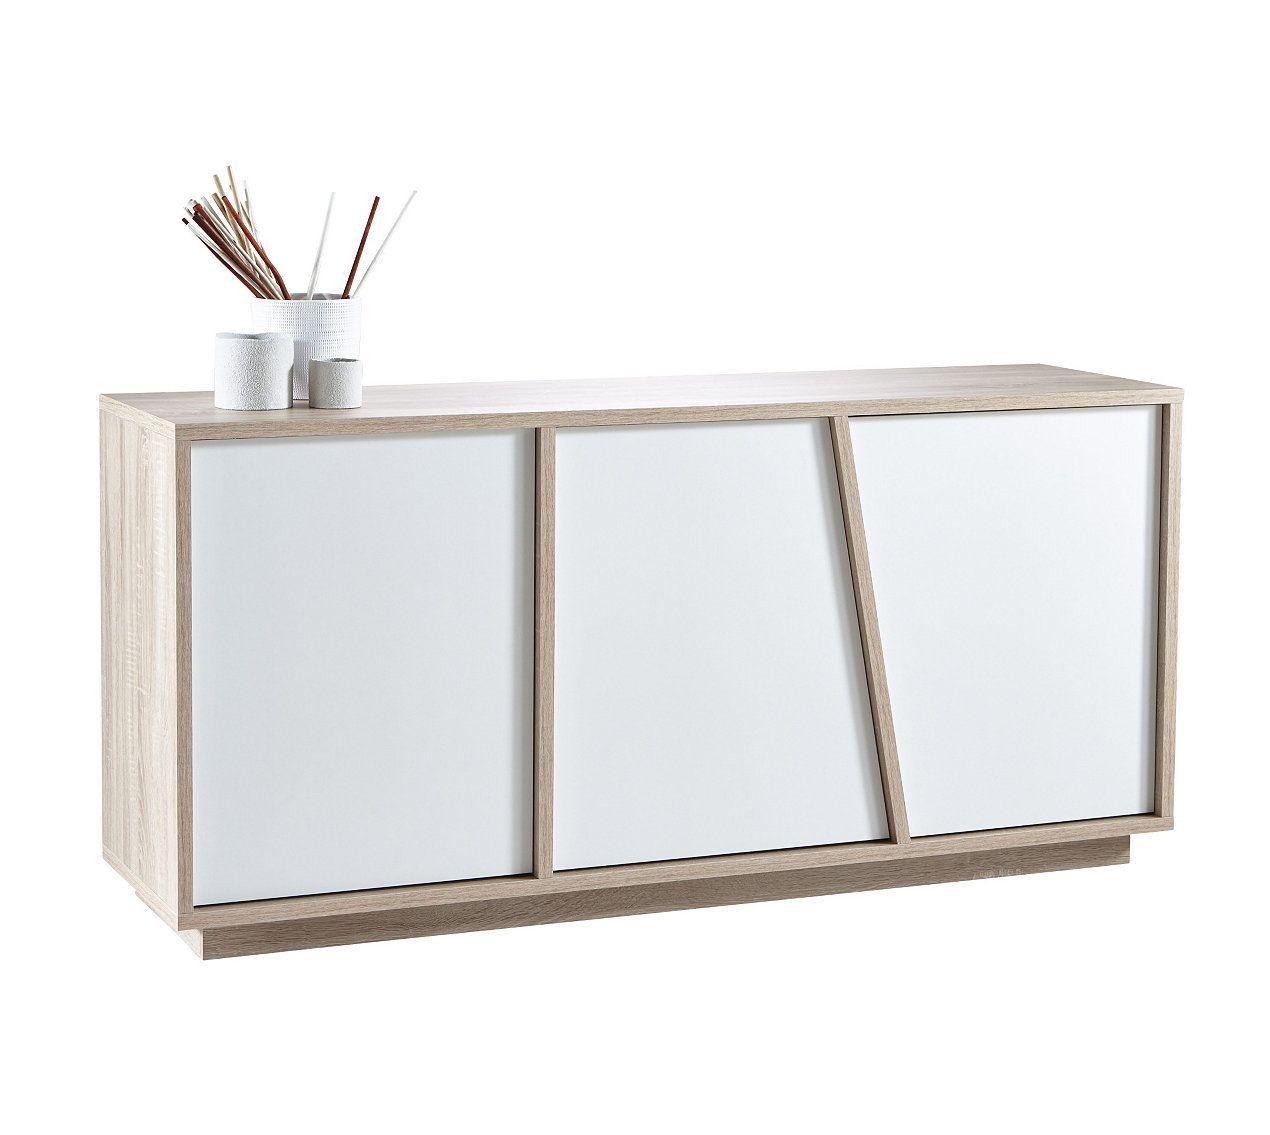 Buffet Nature Evasion Blanc Et Imitation Chene Buffet Bas Panneau Lateral Buffet Design